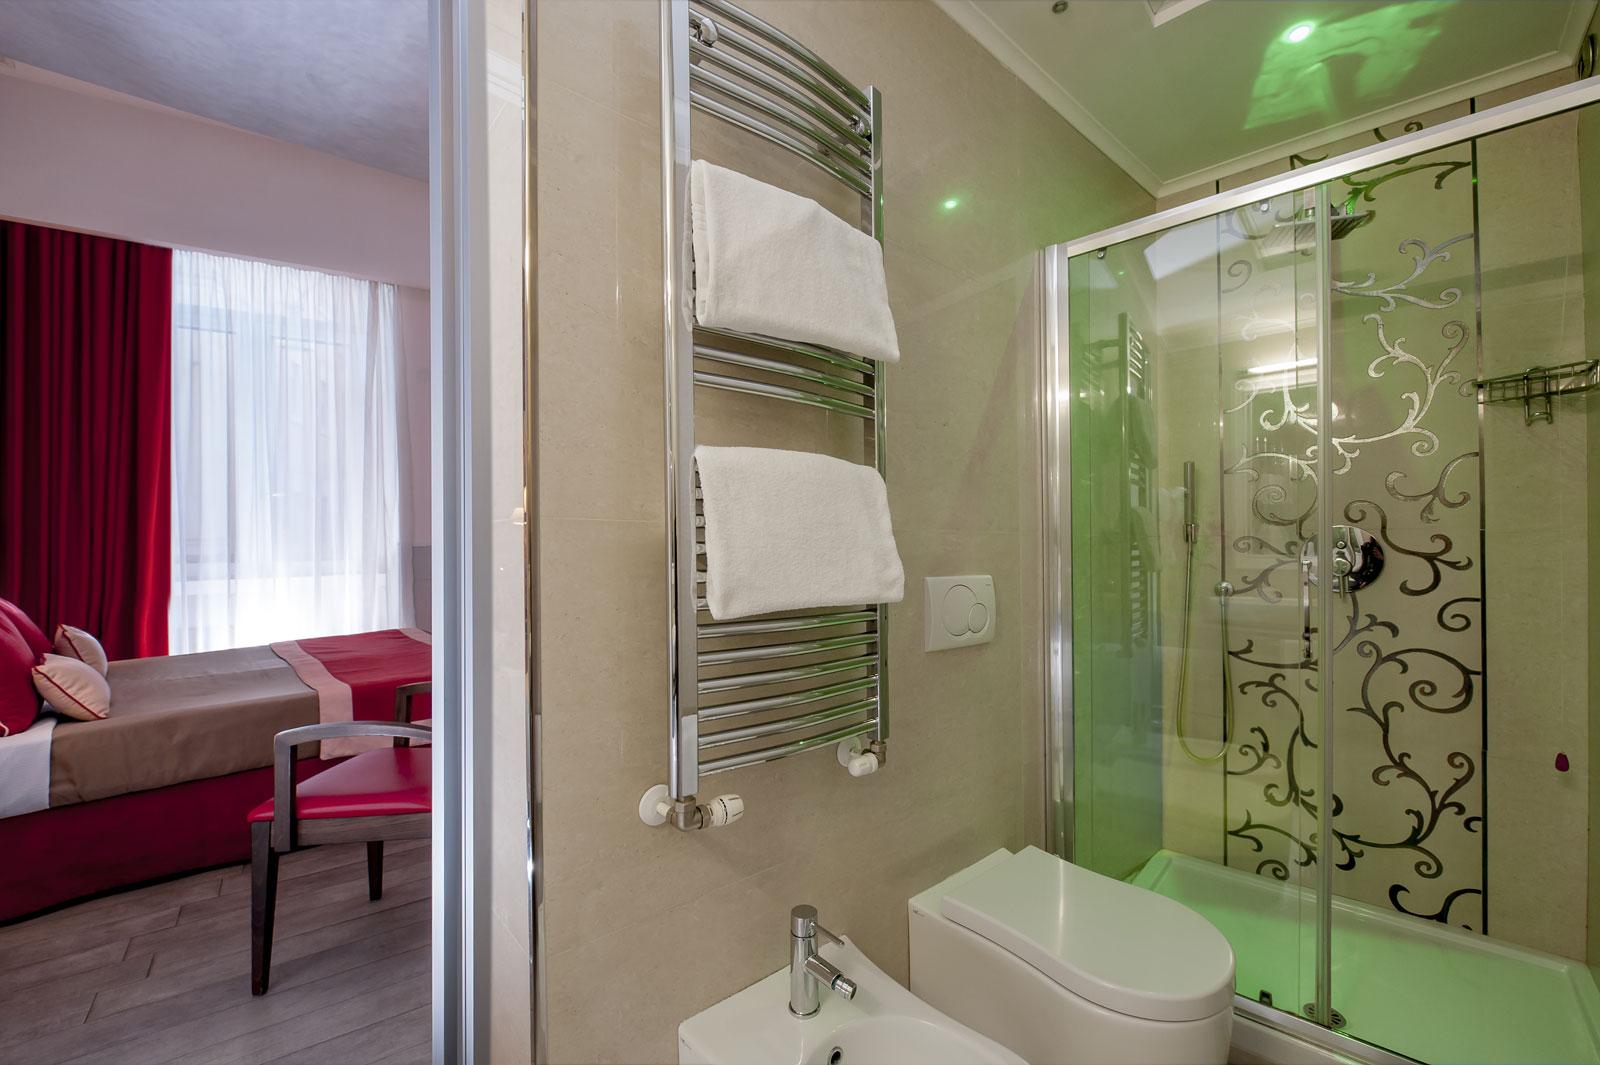 Camera doppia hotel roma camera doppia roma camera for Camera roma